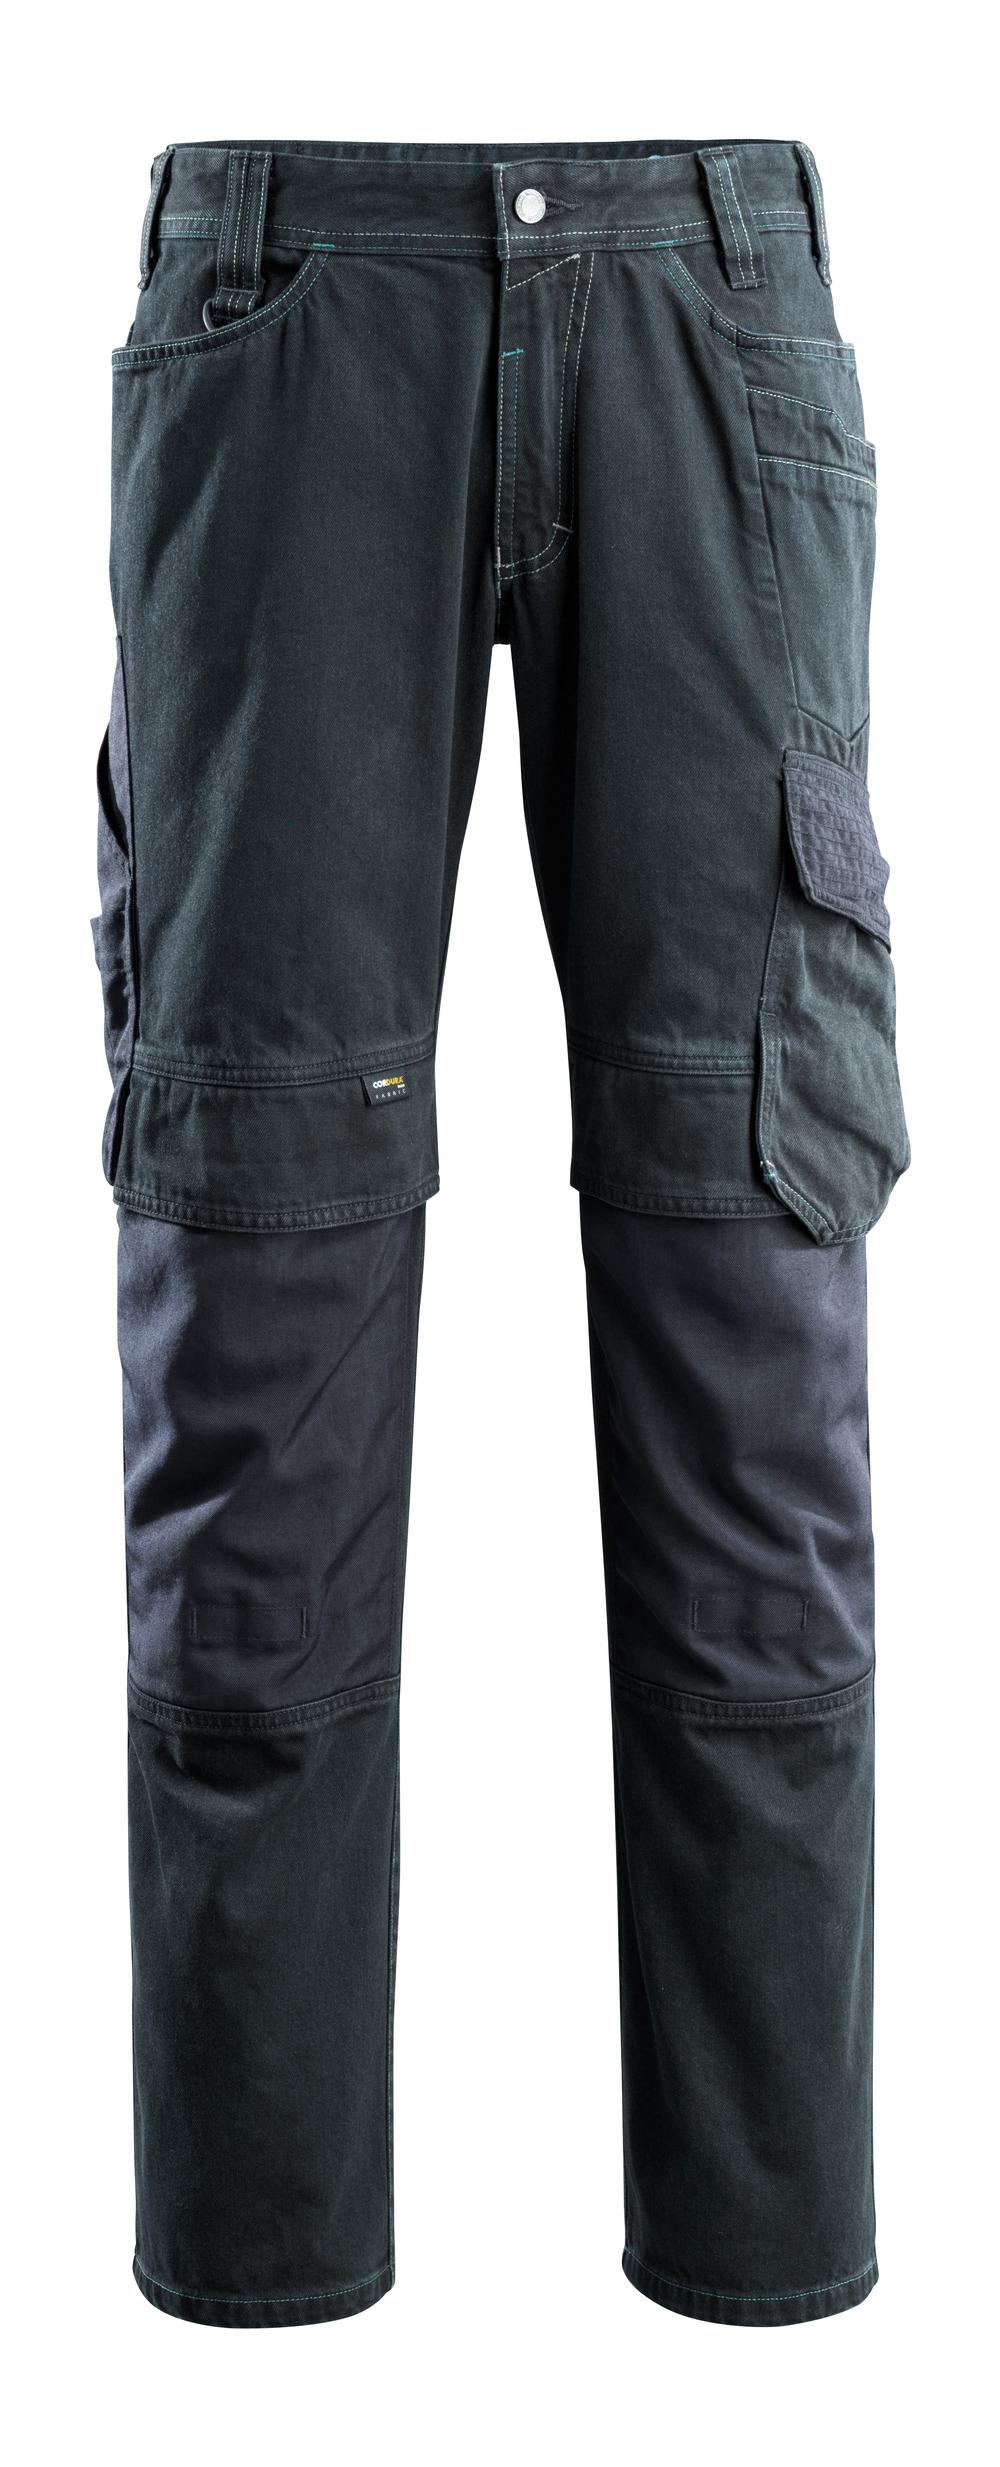 15179-207-86 Jeans with kneepad pockets - dark blue denim